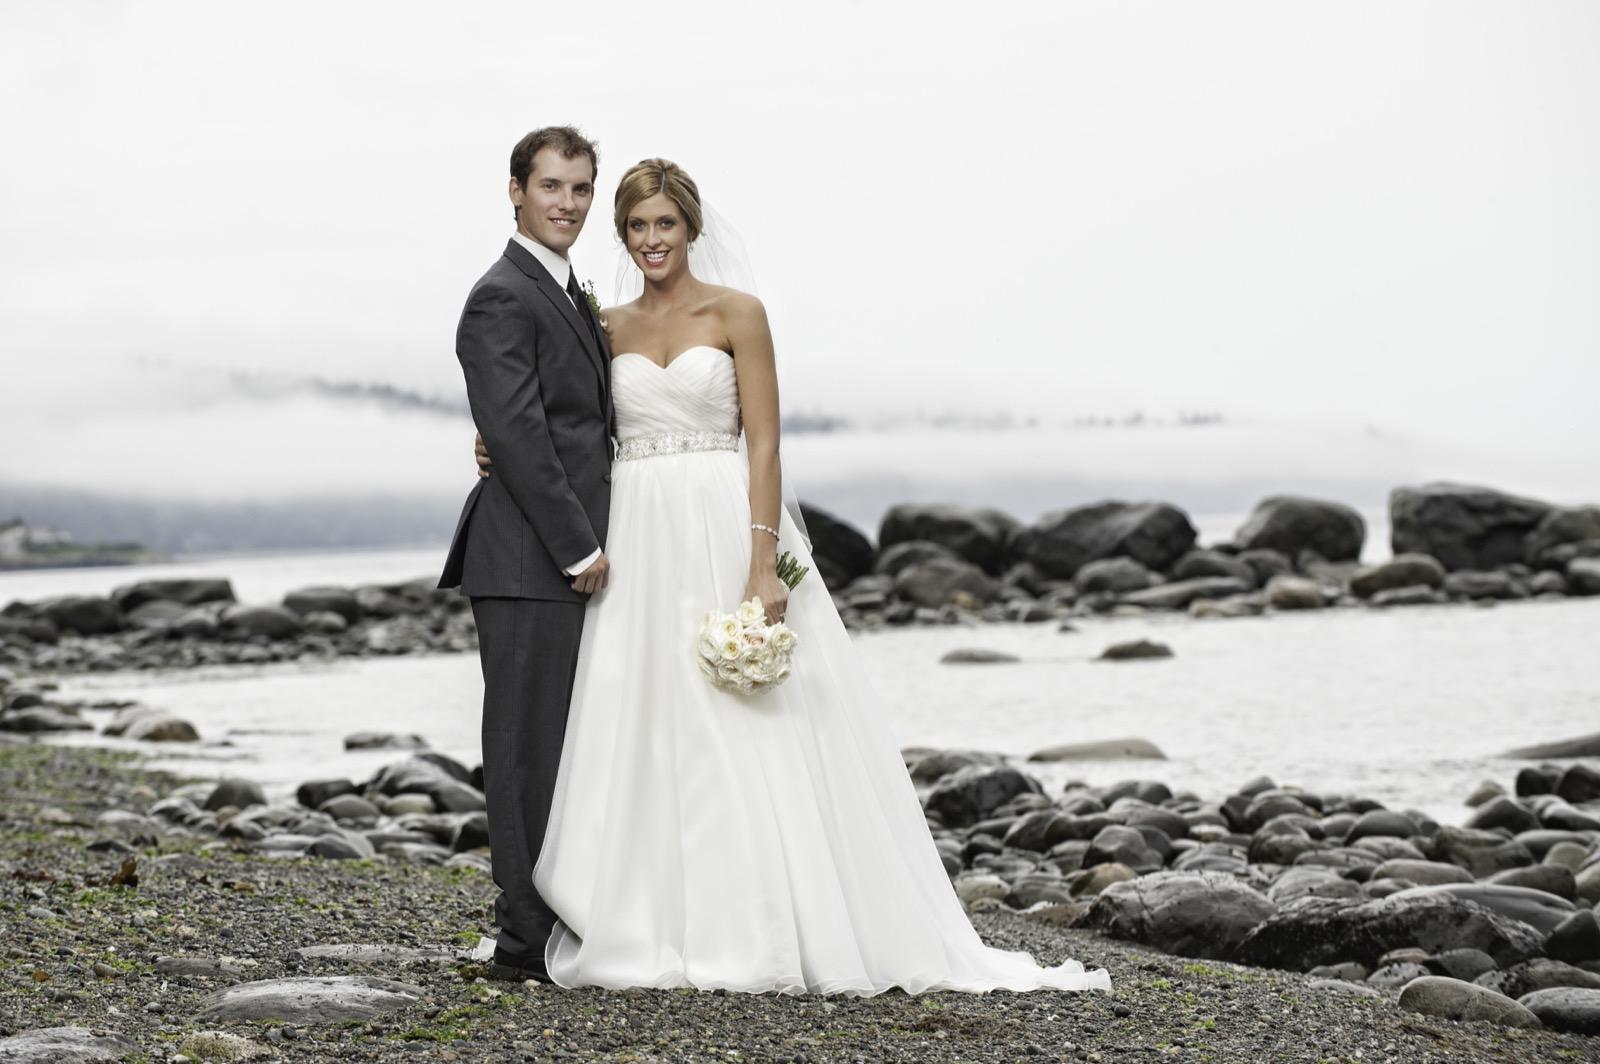 sooke-wedding-photographers-craidelonna-oceanedge-lodge-wedding-65.jpg